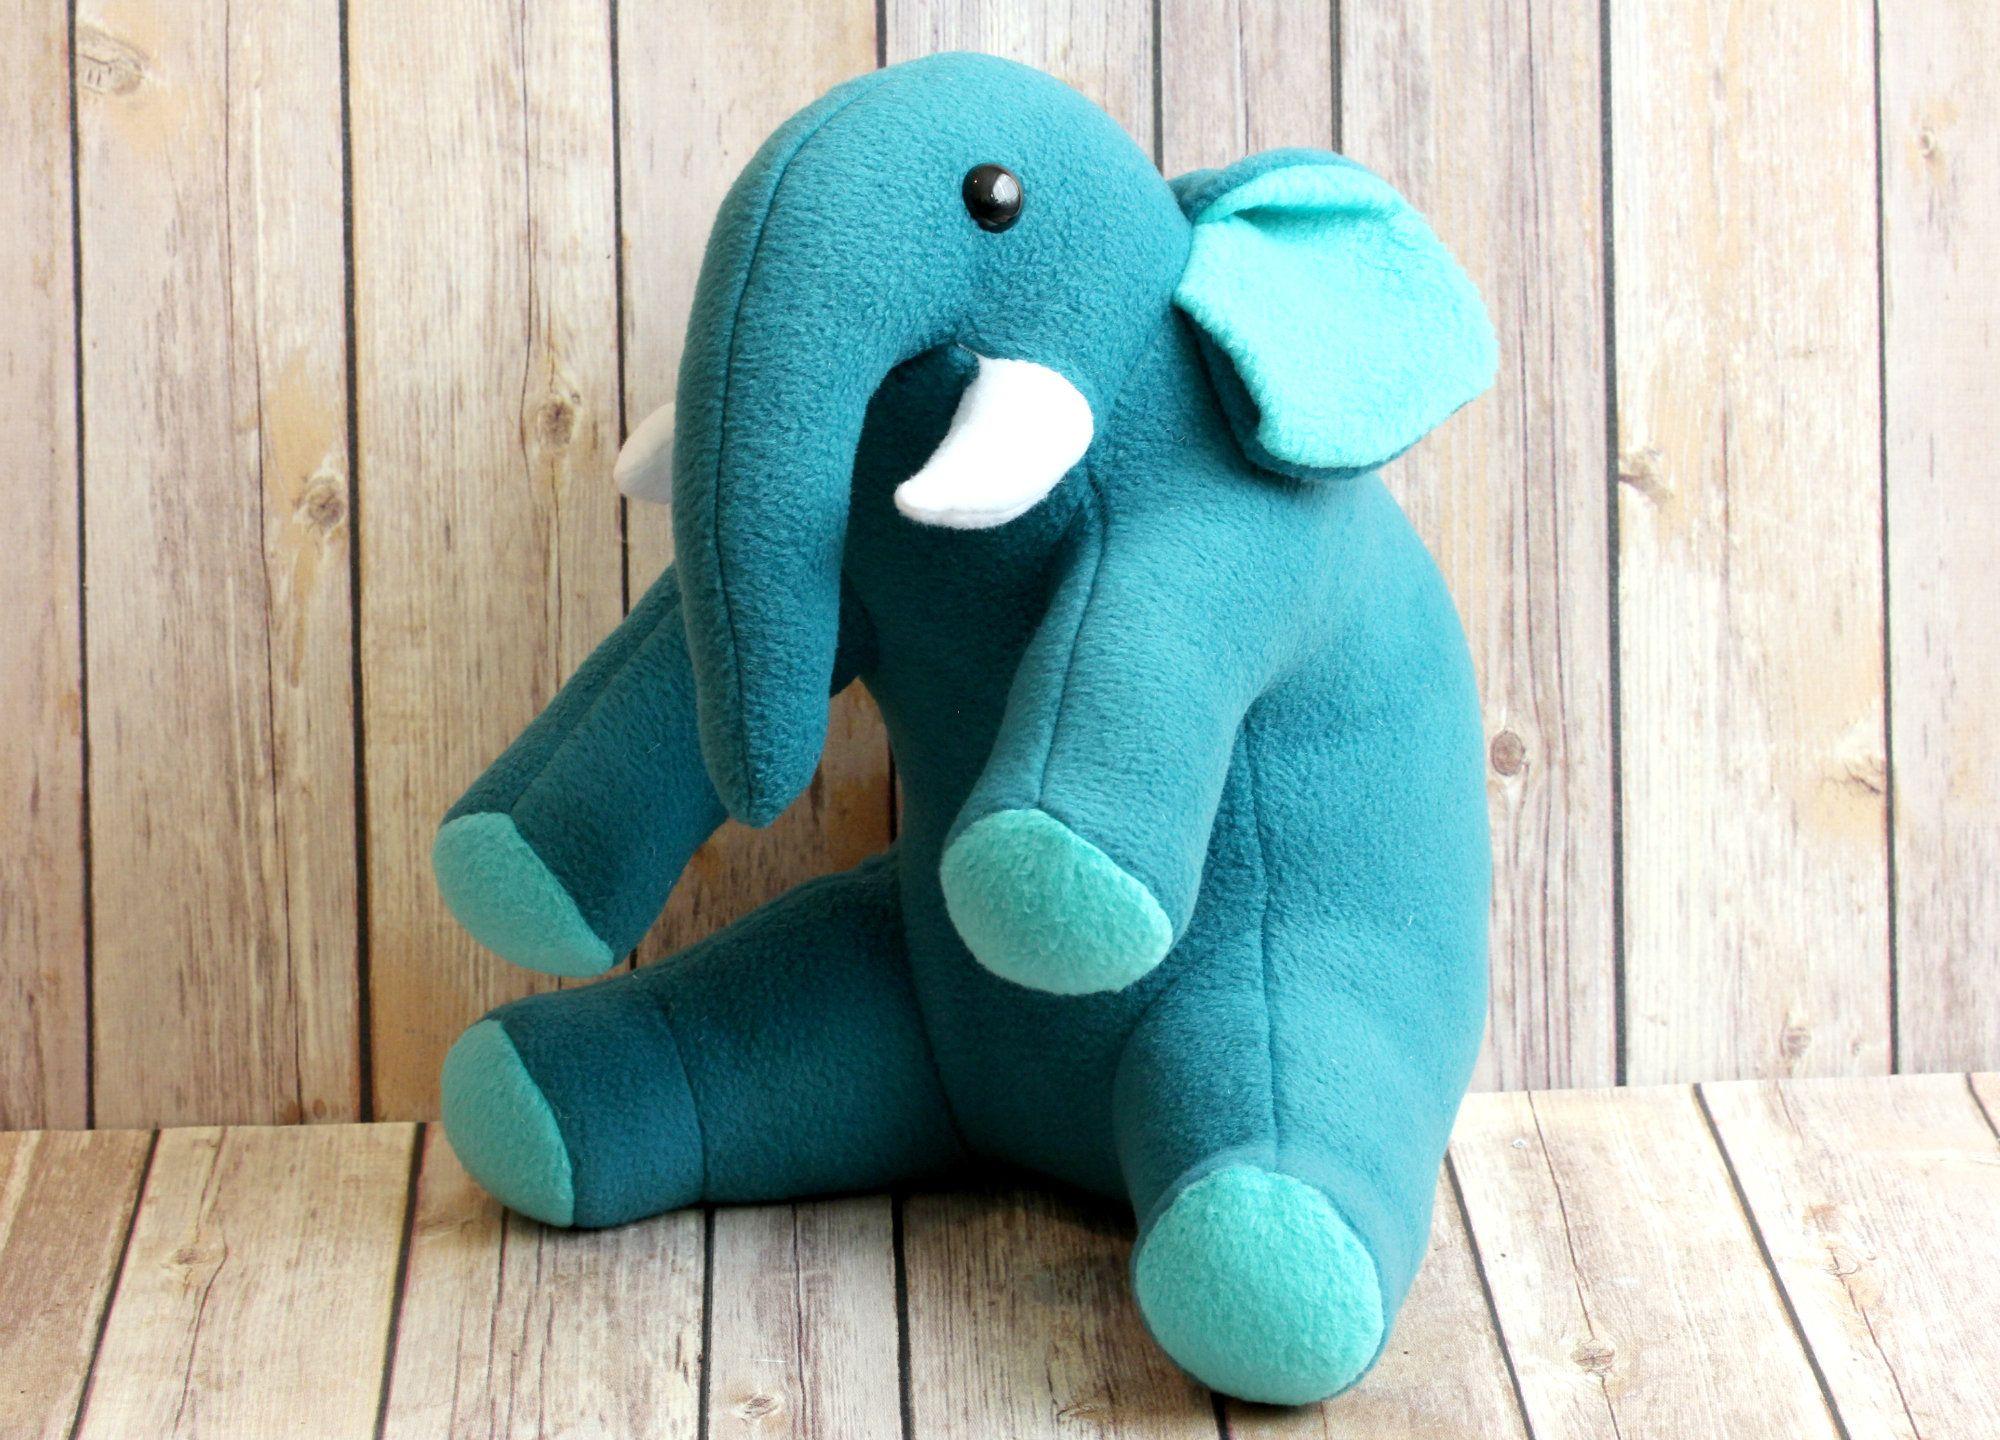 Turquoise Blue Elephant Stuffed Animal Plush Toy Handmade In The Usa Baby Shower Gift Zoo Animal Elephant Stuffed Animal Animal Plush Toys Animal Kids Room